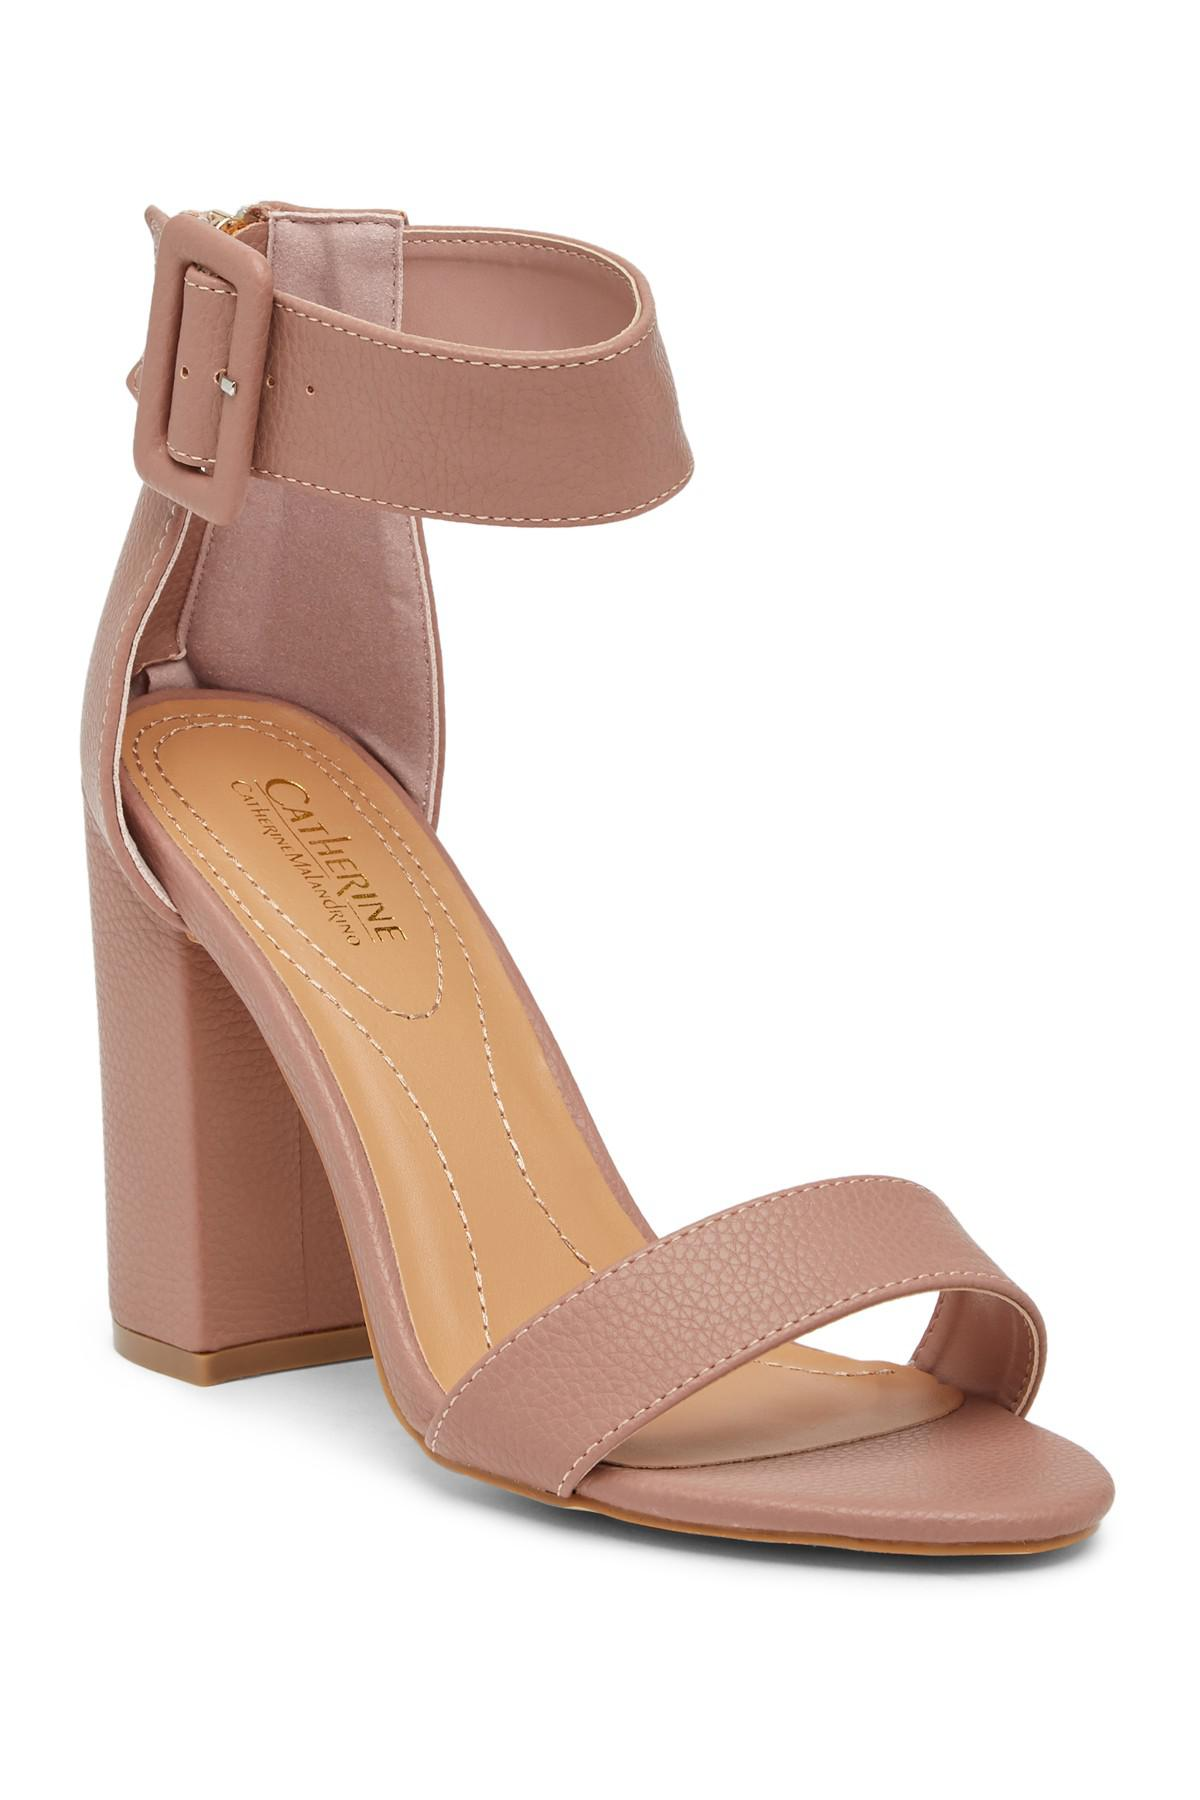 ba3f6c59f20 Lyst - Catherine Malandrino Seaker Open Toe Heeled Sandal